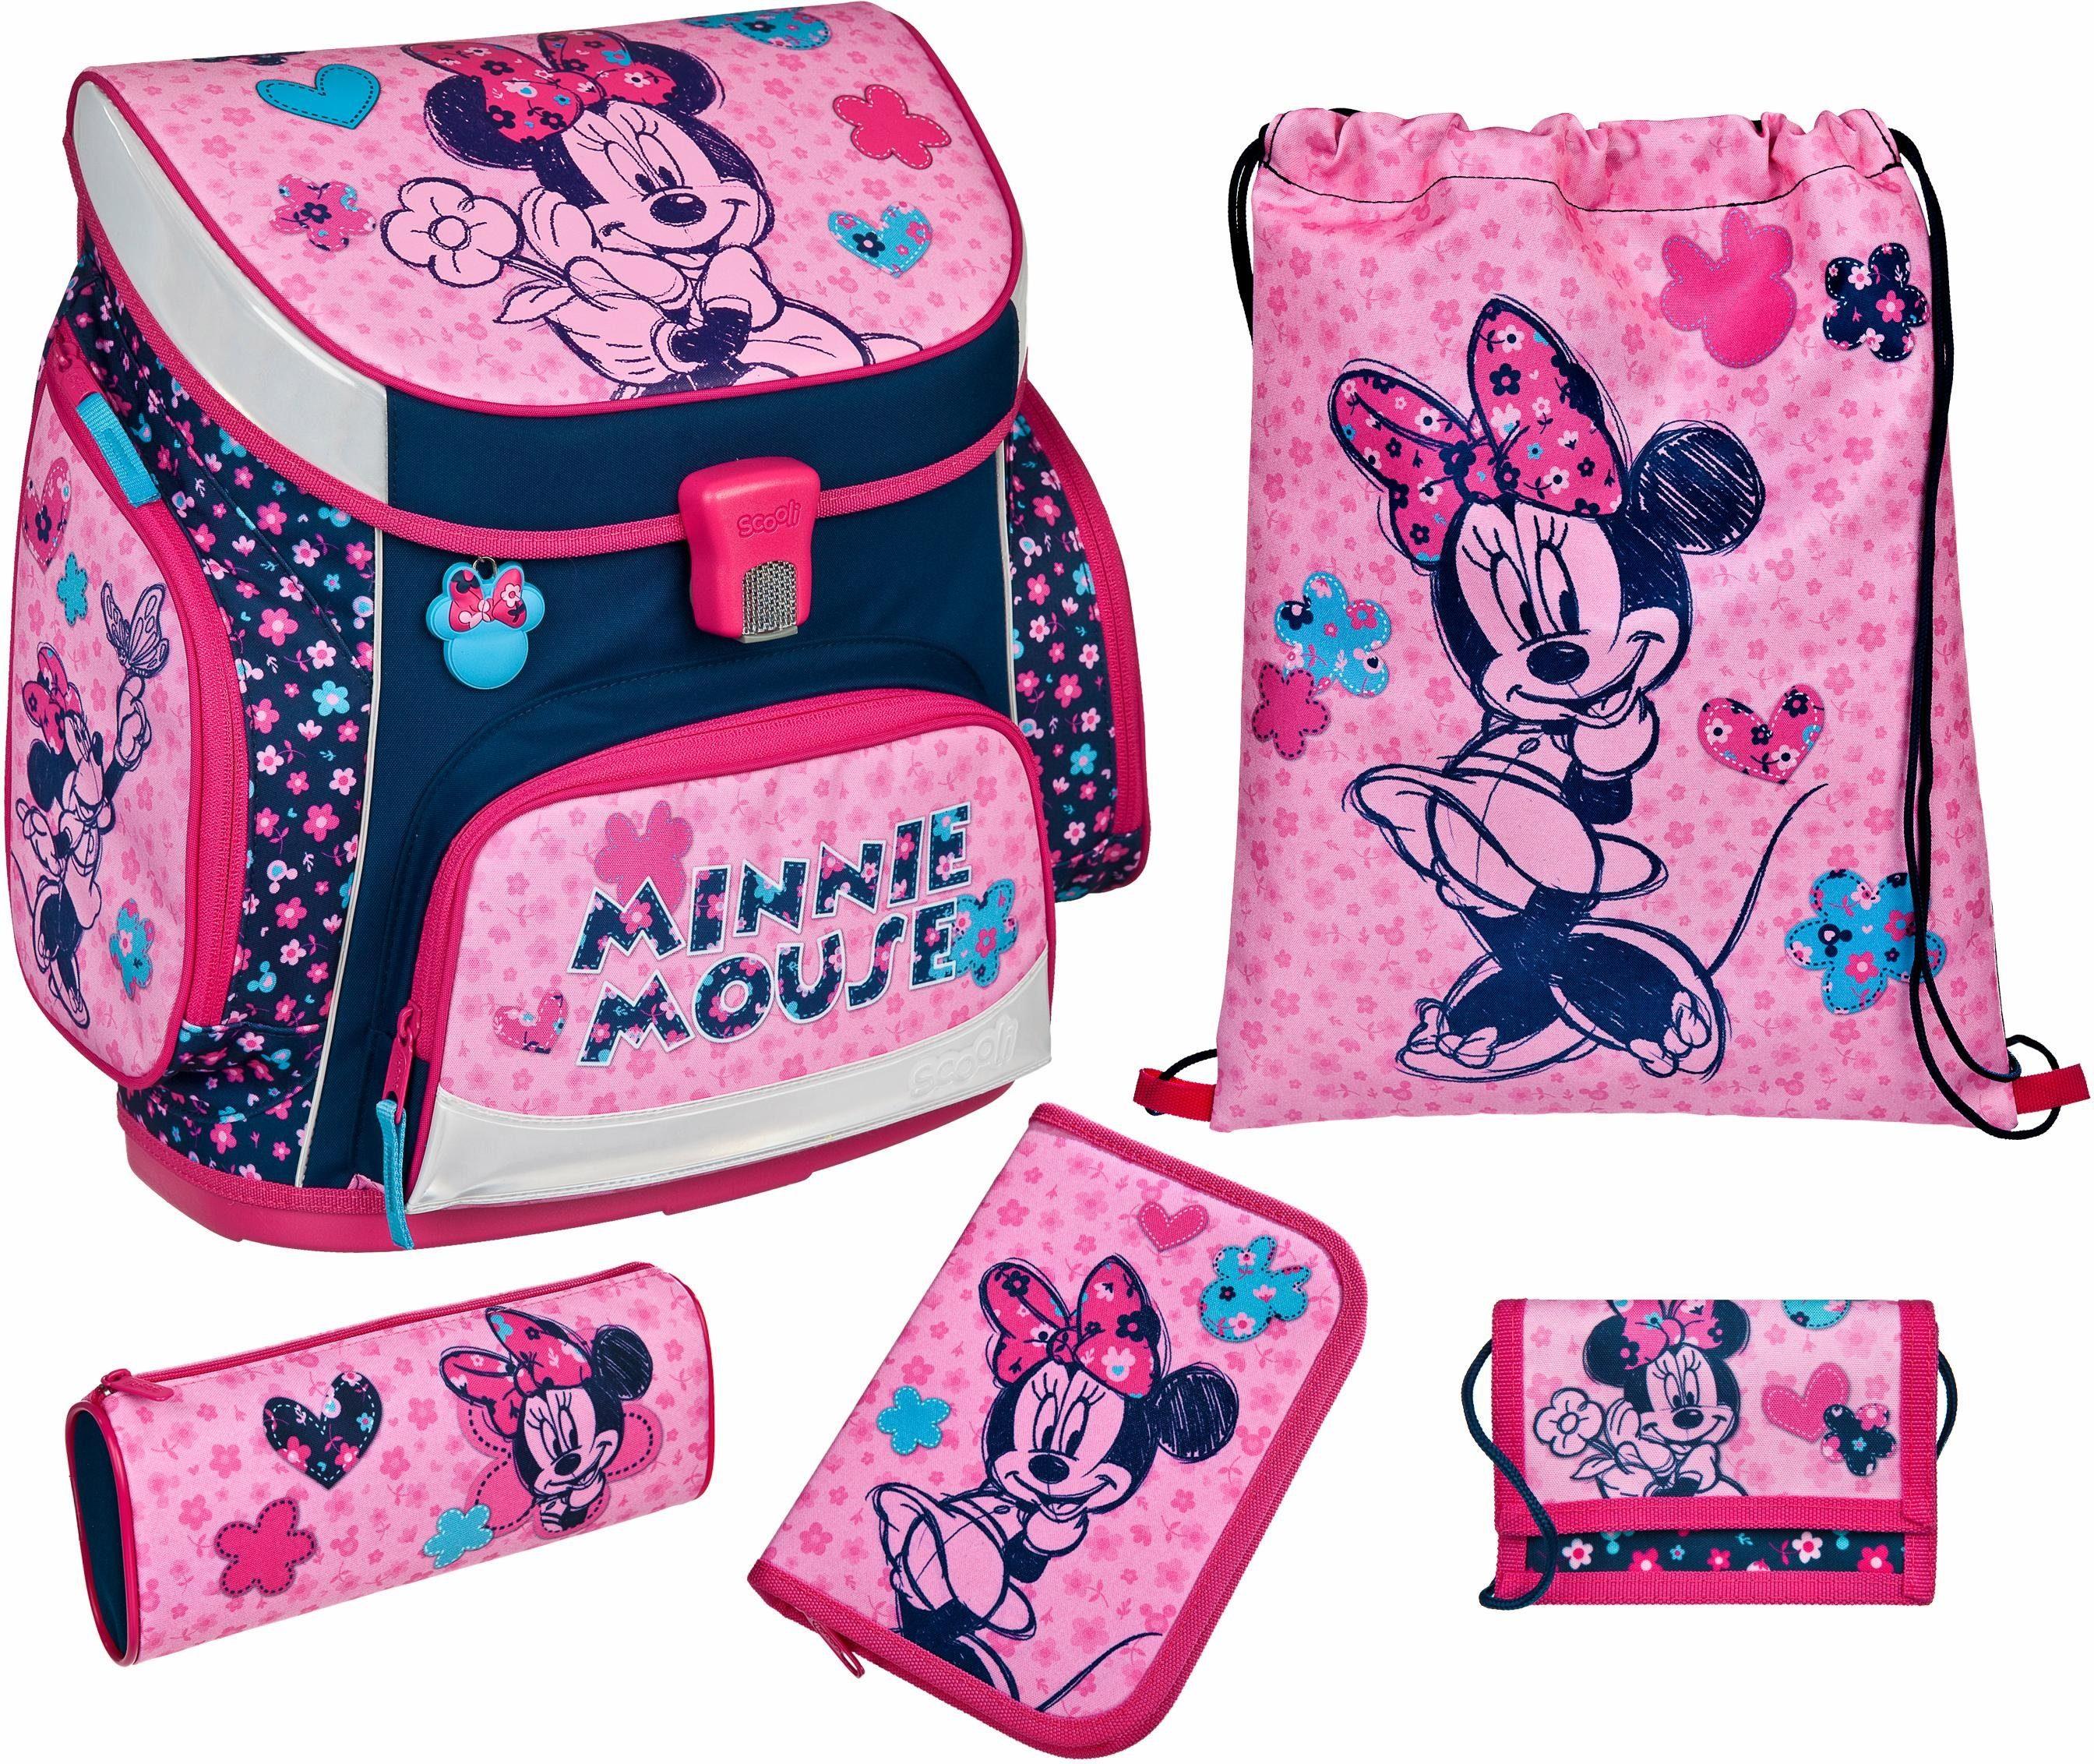 Minnie Mouse Schulranzen Set 12tl Disney Federmappe Sporttasche Maus rosa